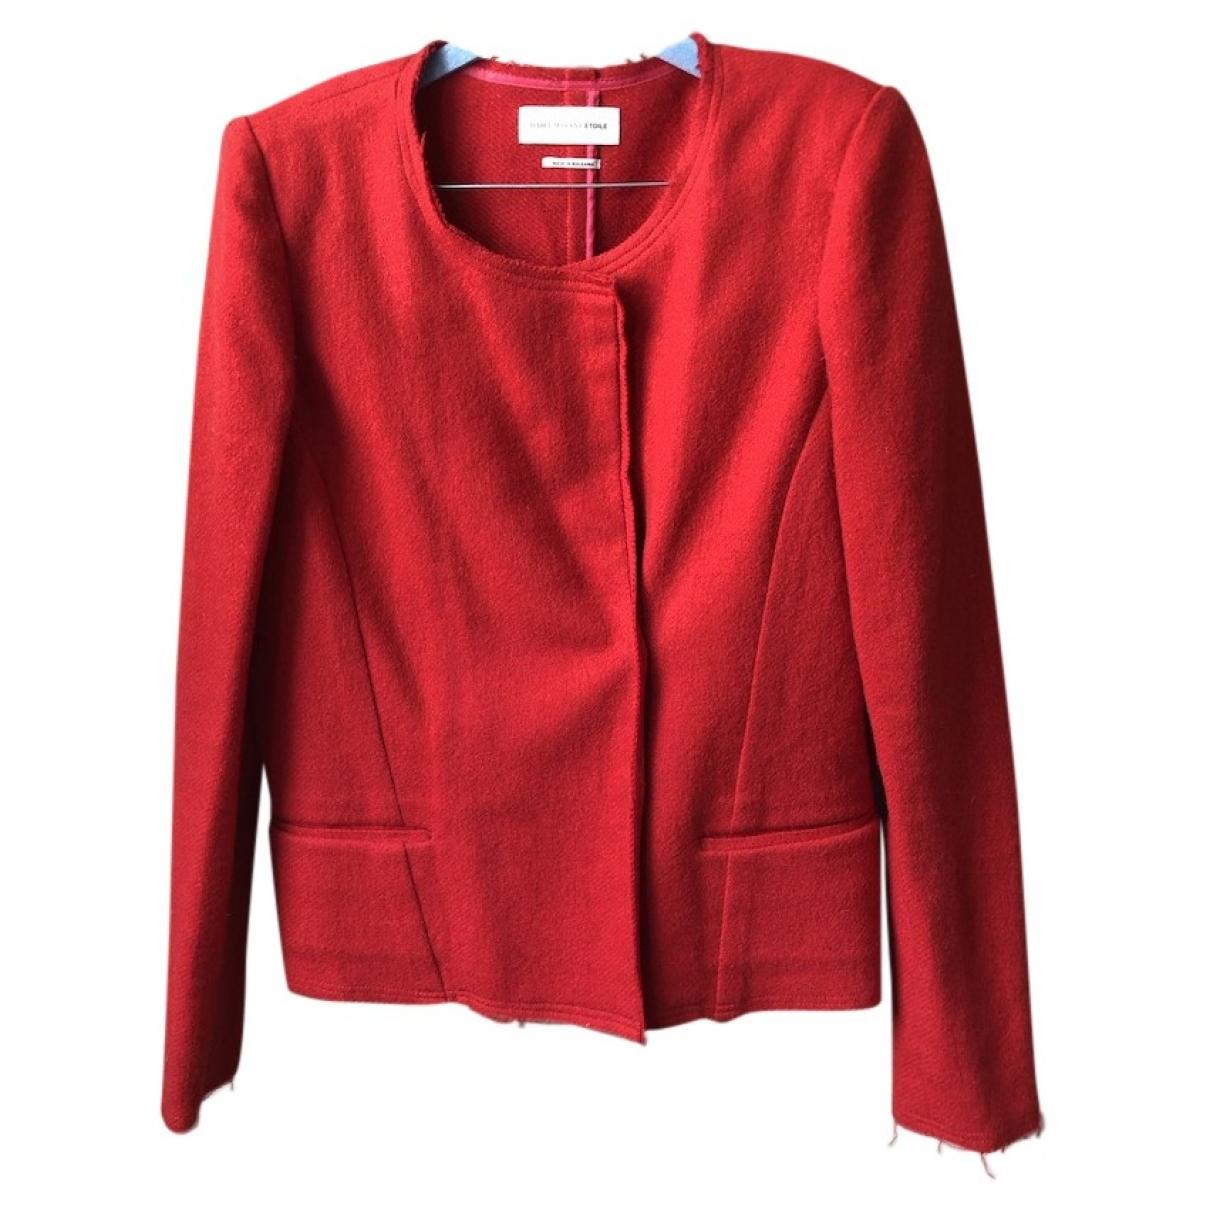 Isabel Marant Etoile \N Red Wool jacket for Women 38 FR